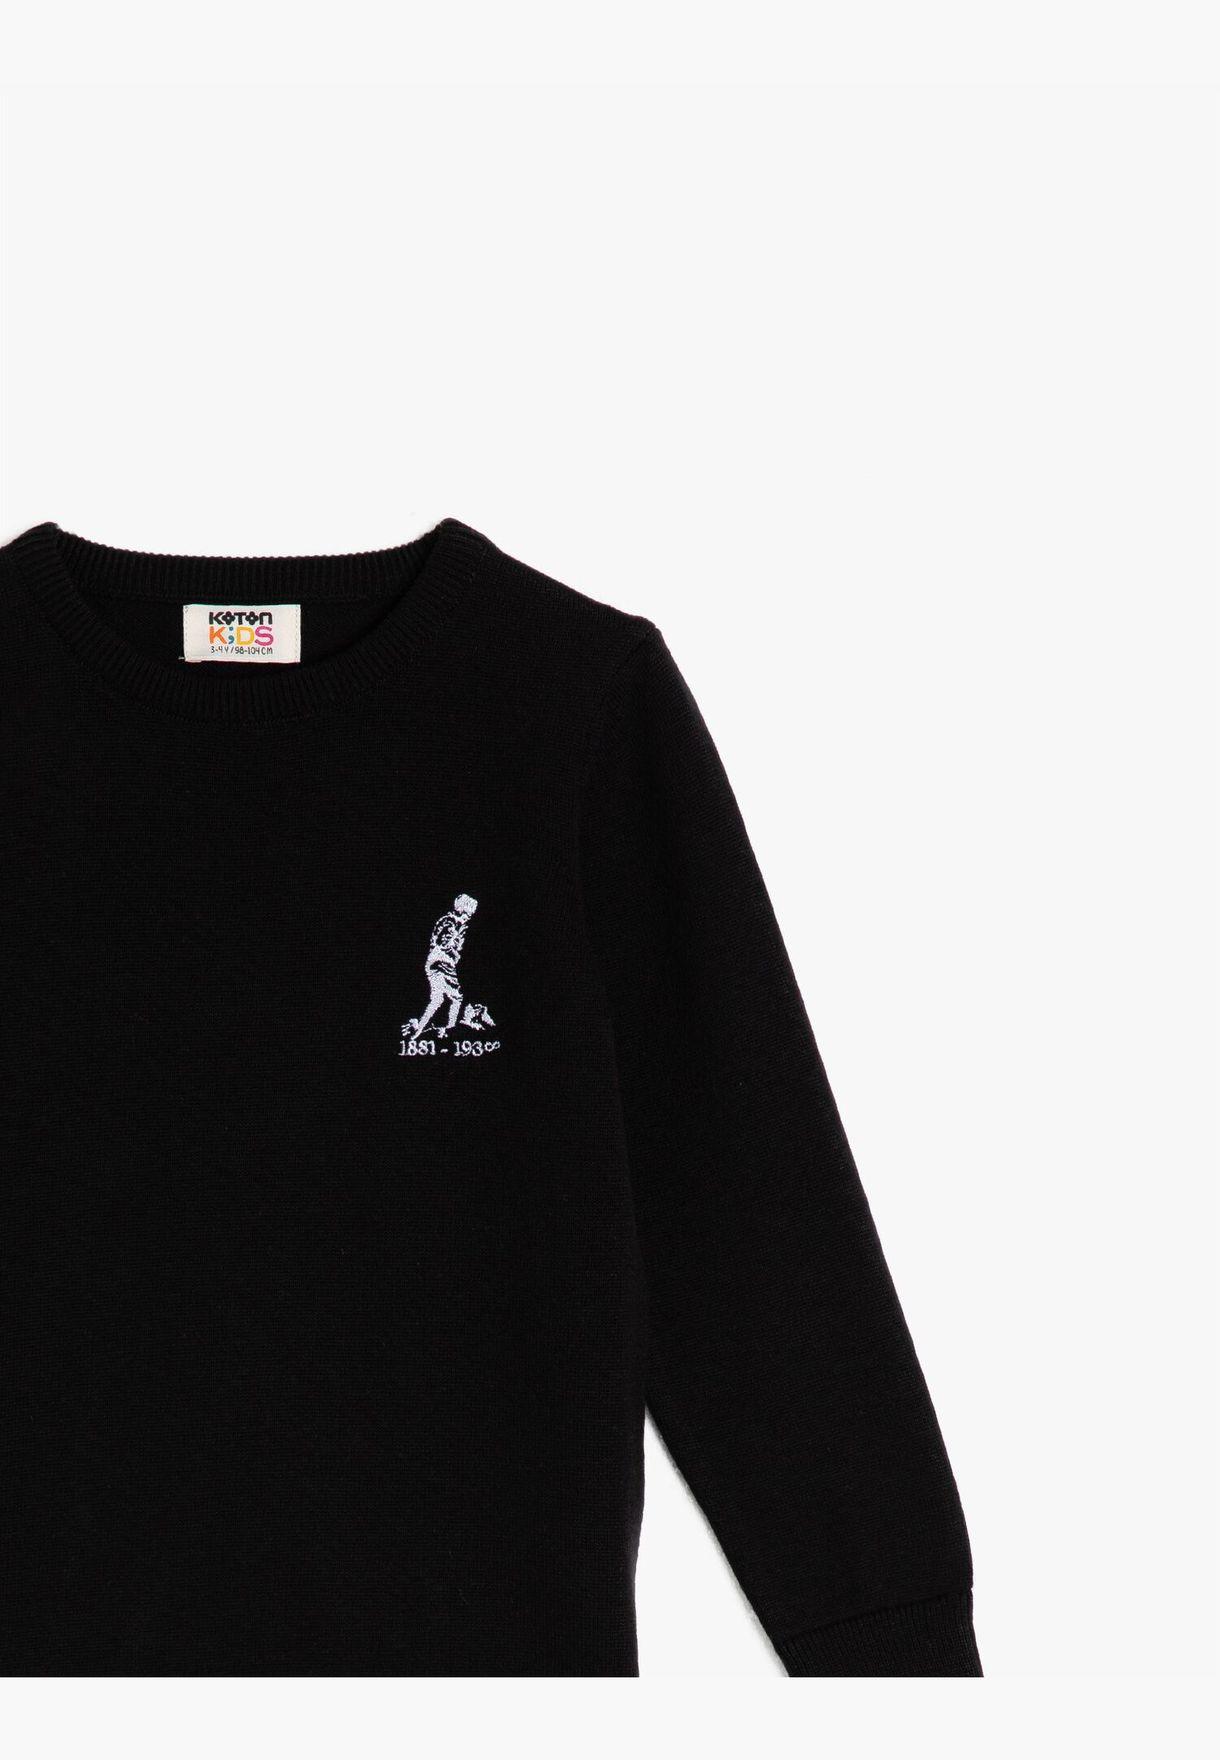 100% Cotton Crew Neck Long Sleeve Atatürk Printed Jumper